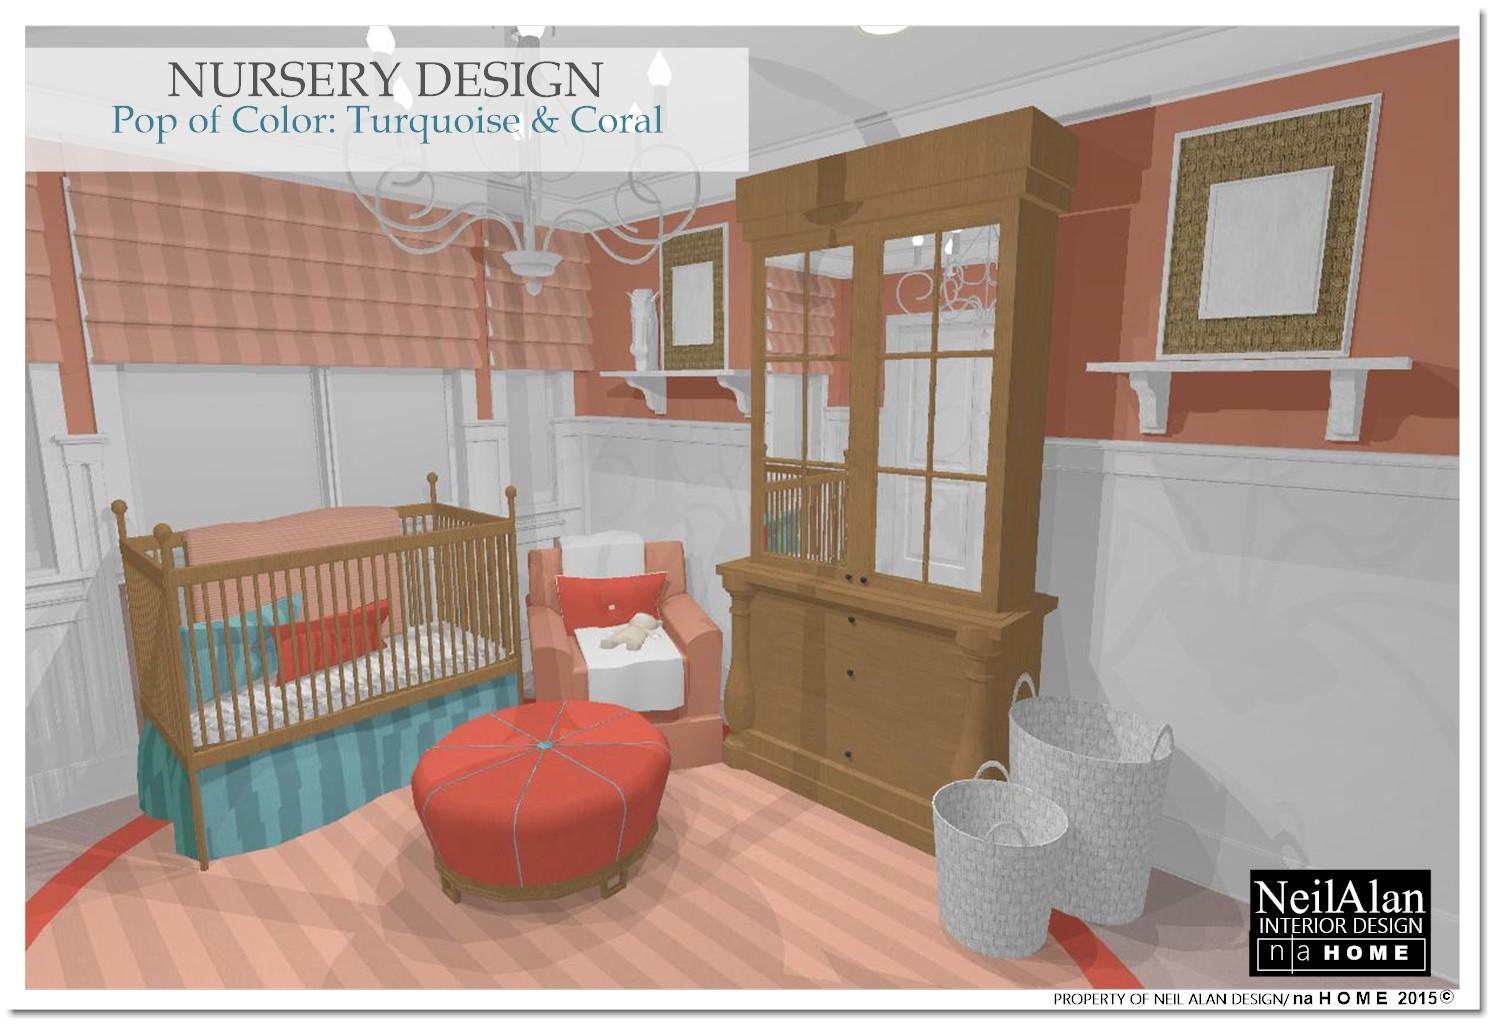 Neil Alan DesignsNursery Pop of Color.jpg